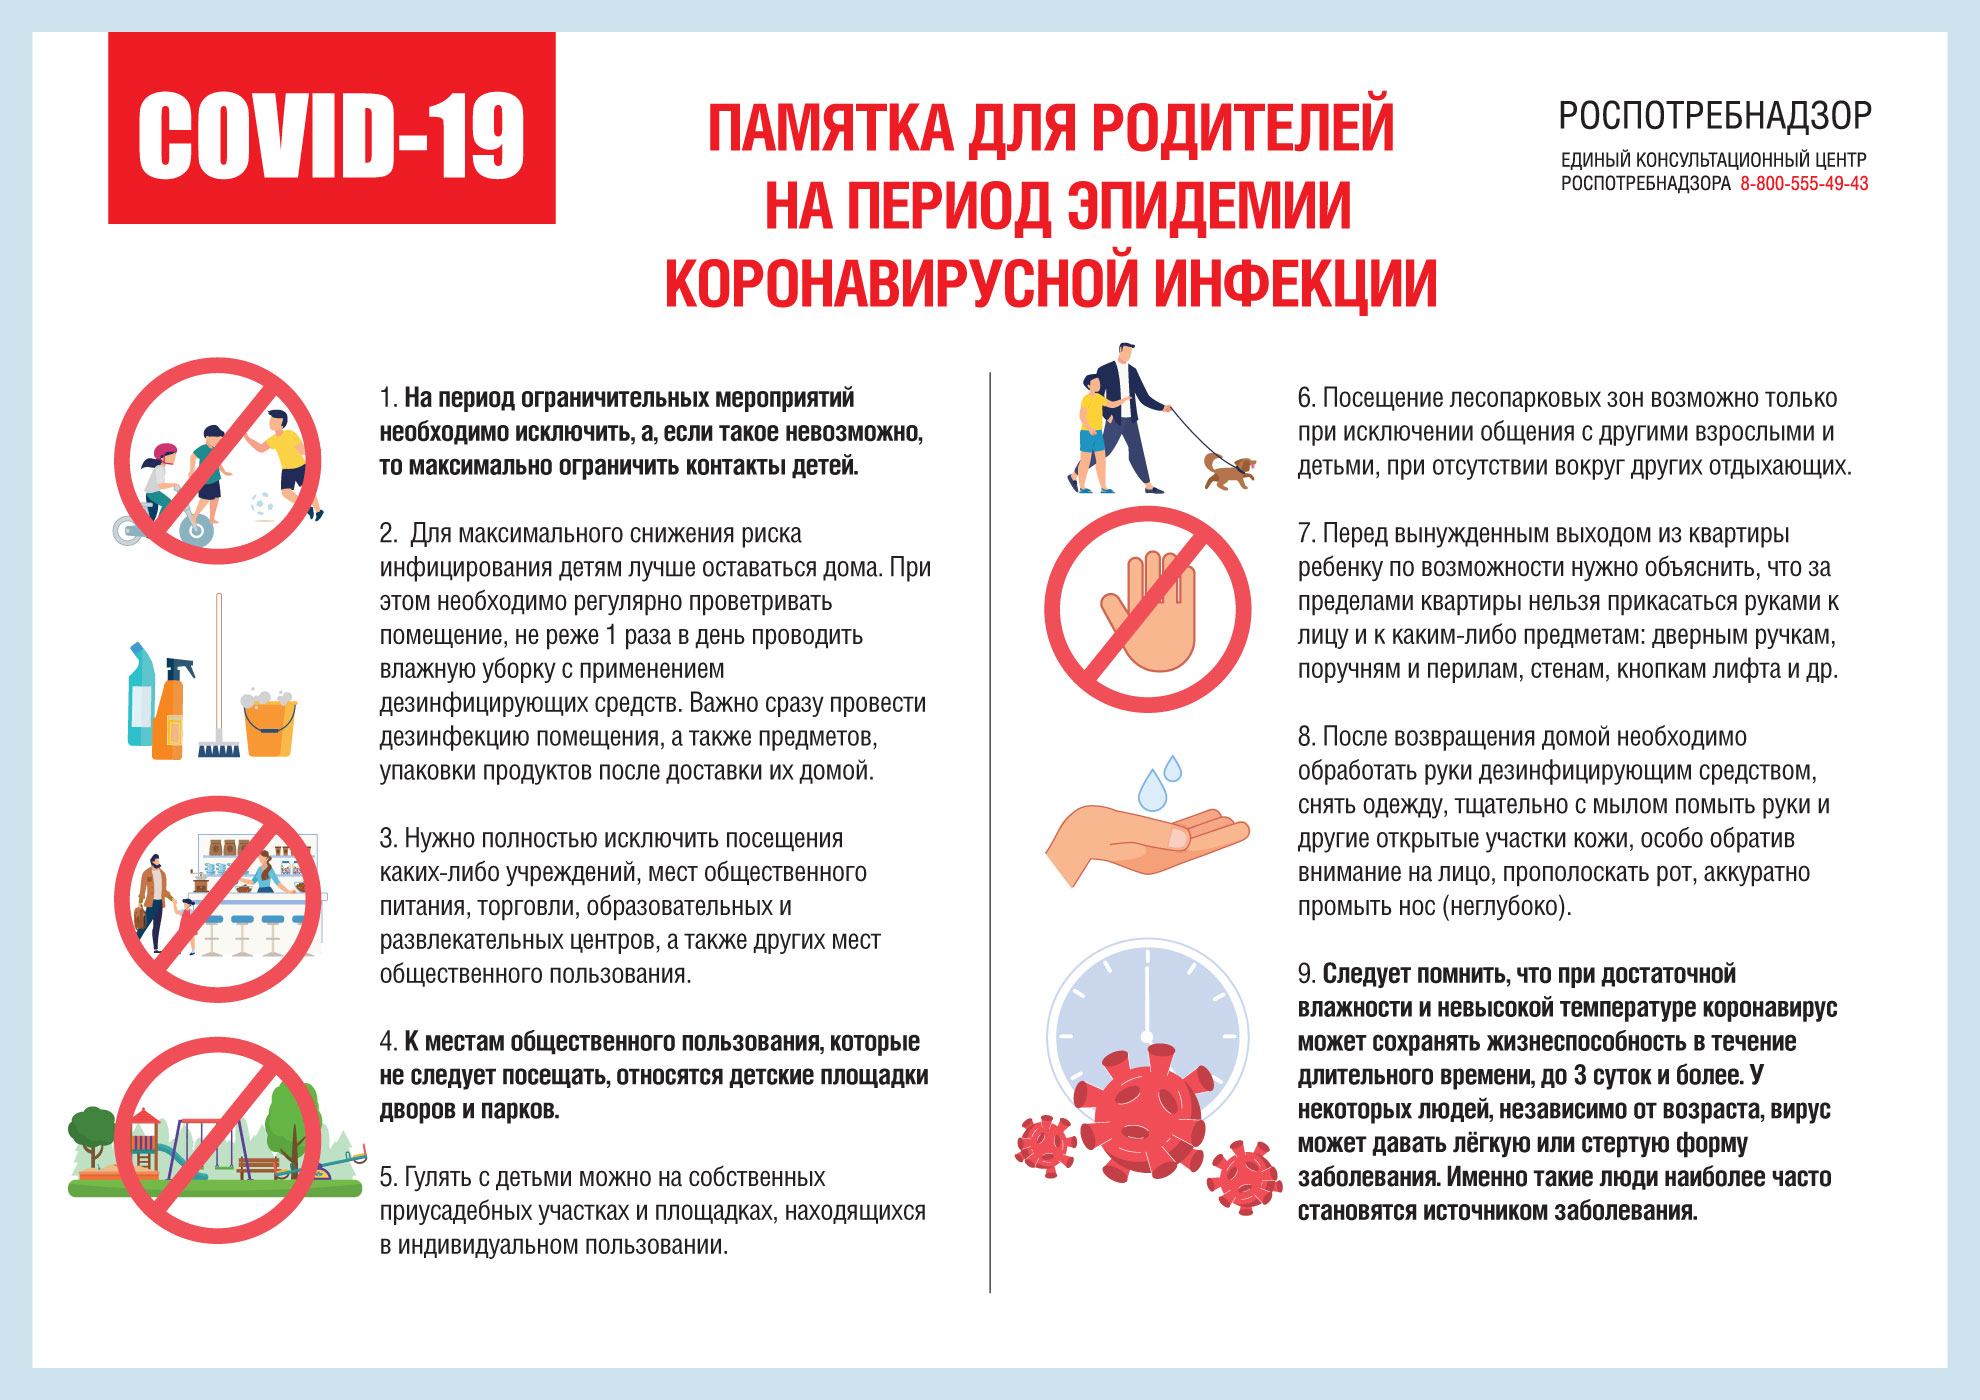 Риск инфицирования ребенка